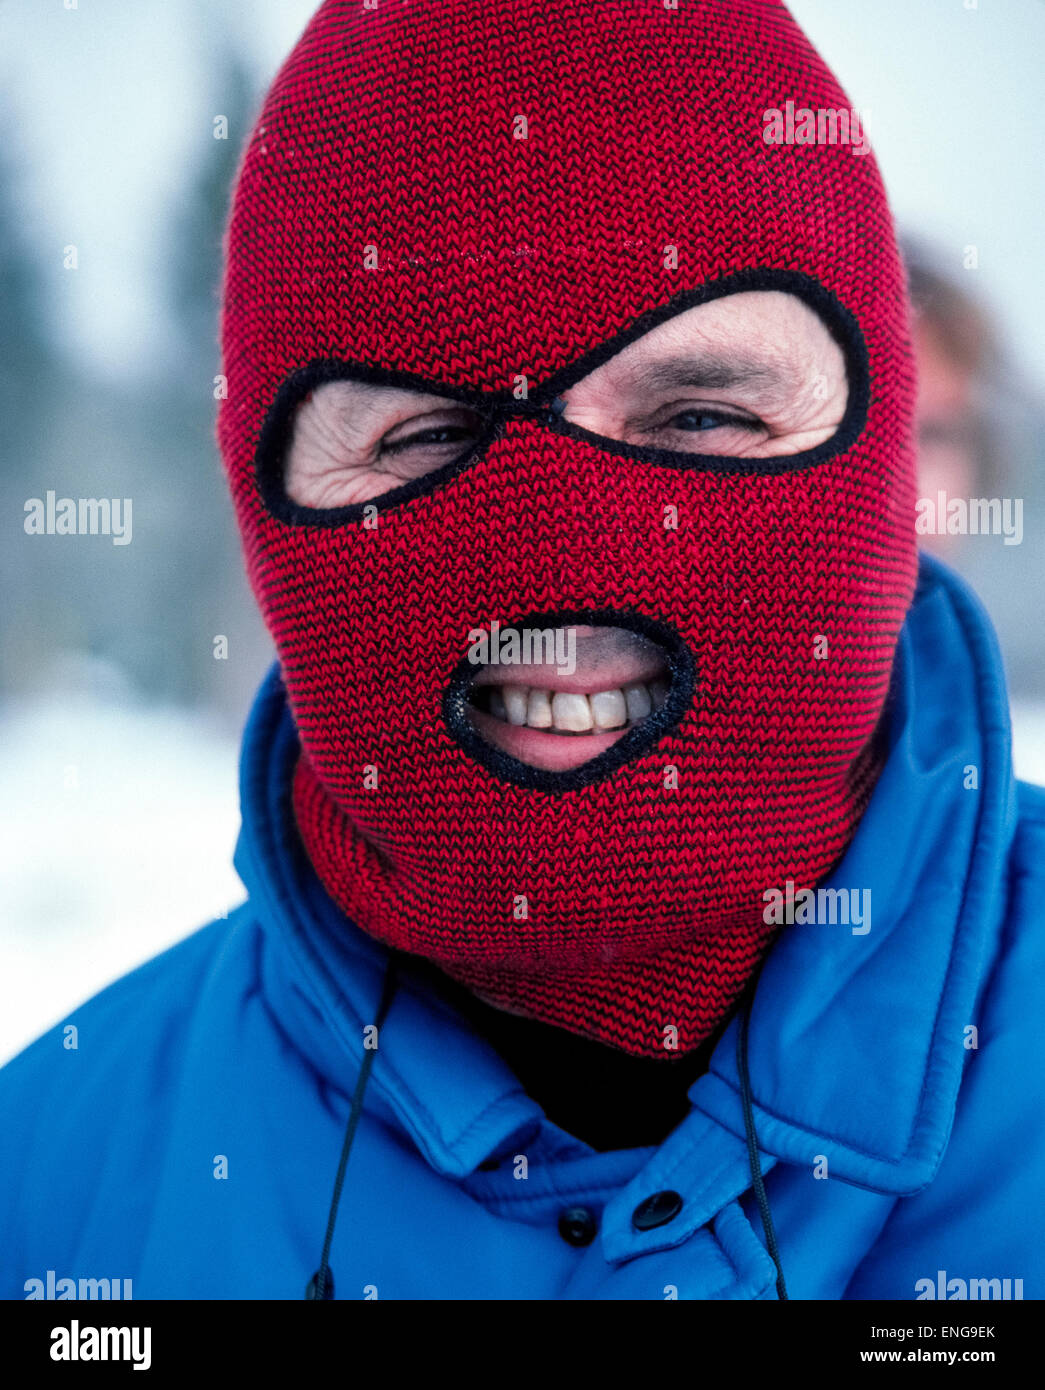 Balaclava Helmet Stockfotos & Balaclava Helmet Bilder - Alamy